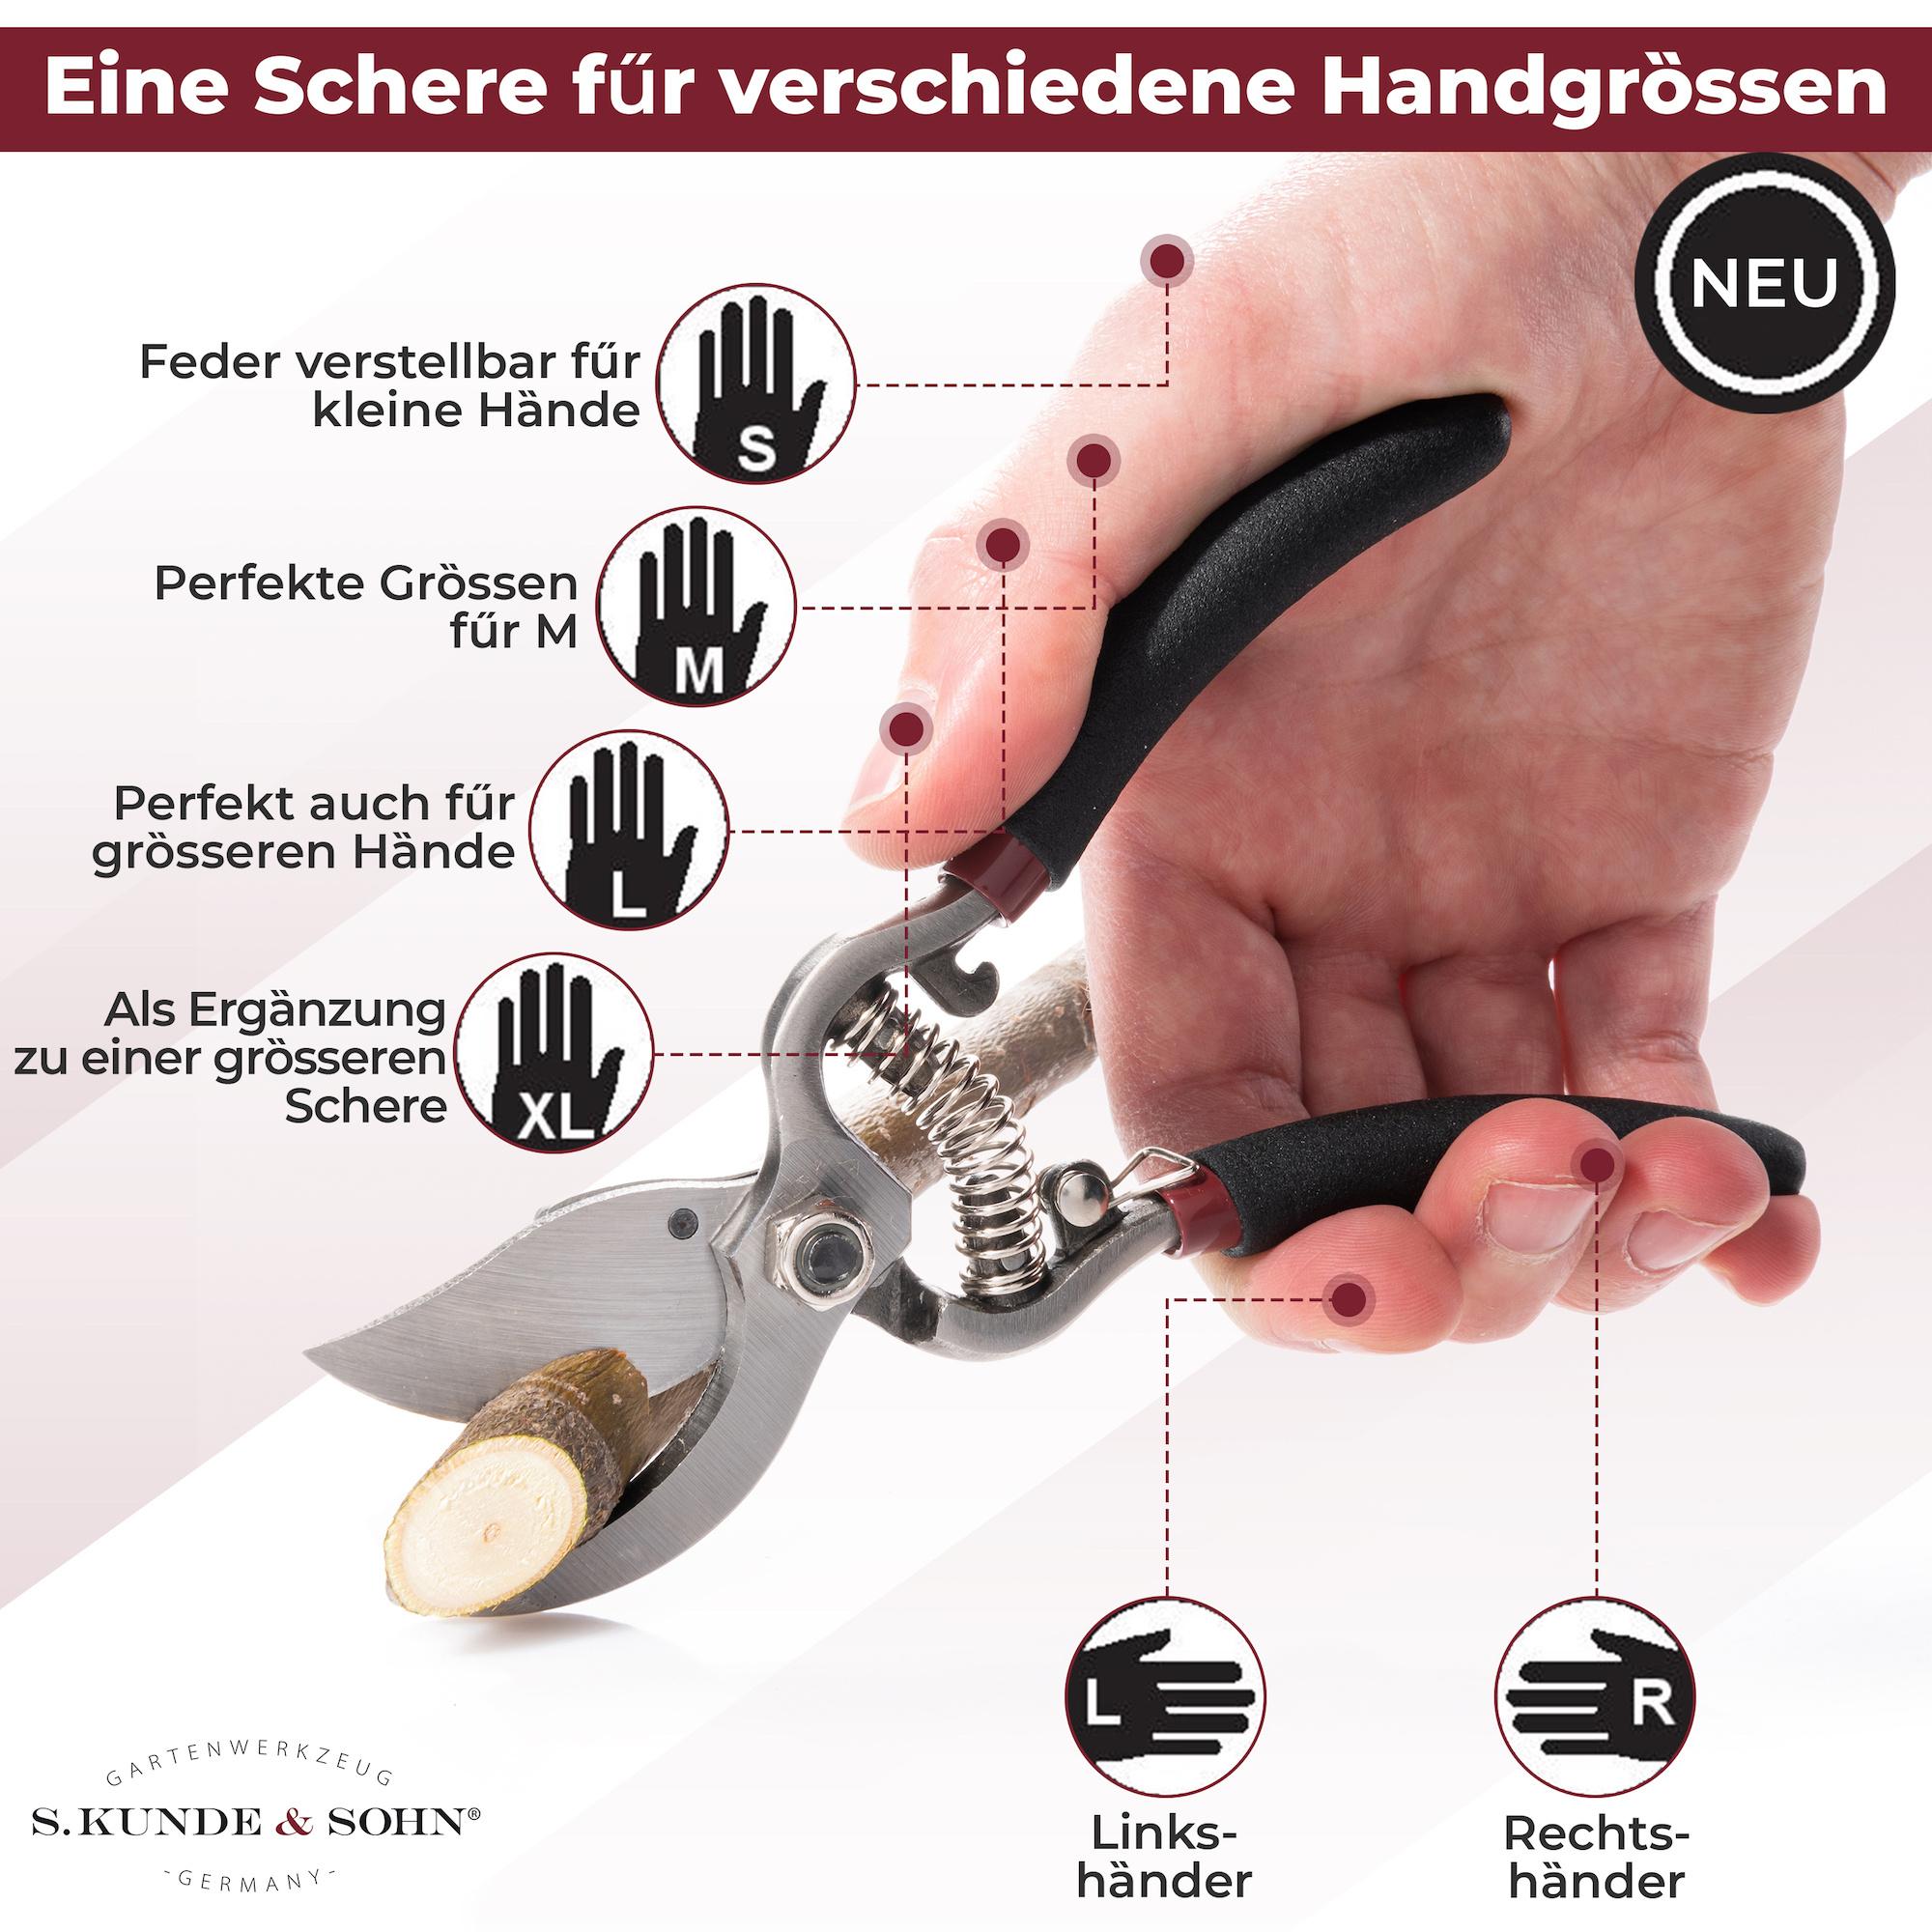 S. Kunde & Sohn Germany SKS 6s Tradition Schwarz/Klinge silber 2er Set - Scheren